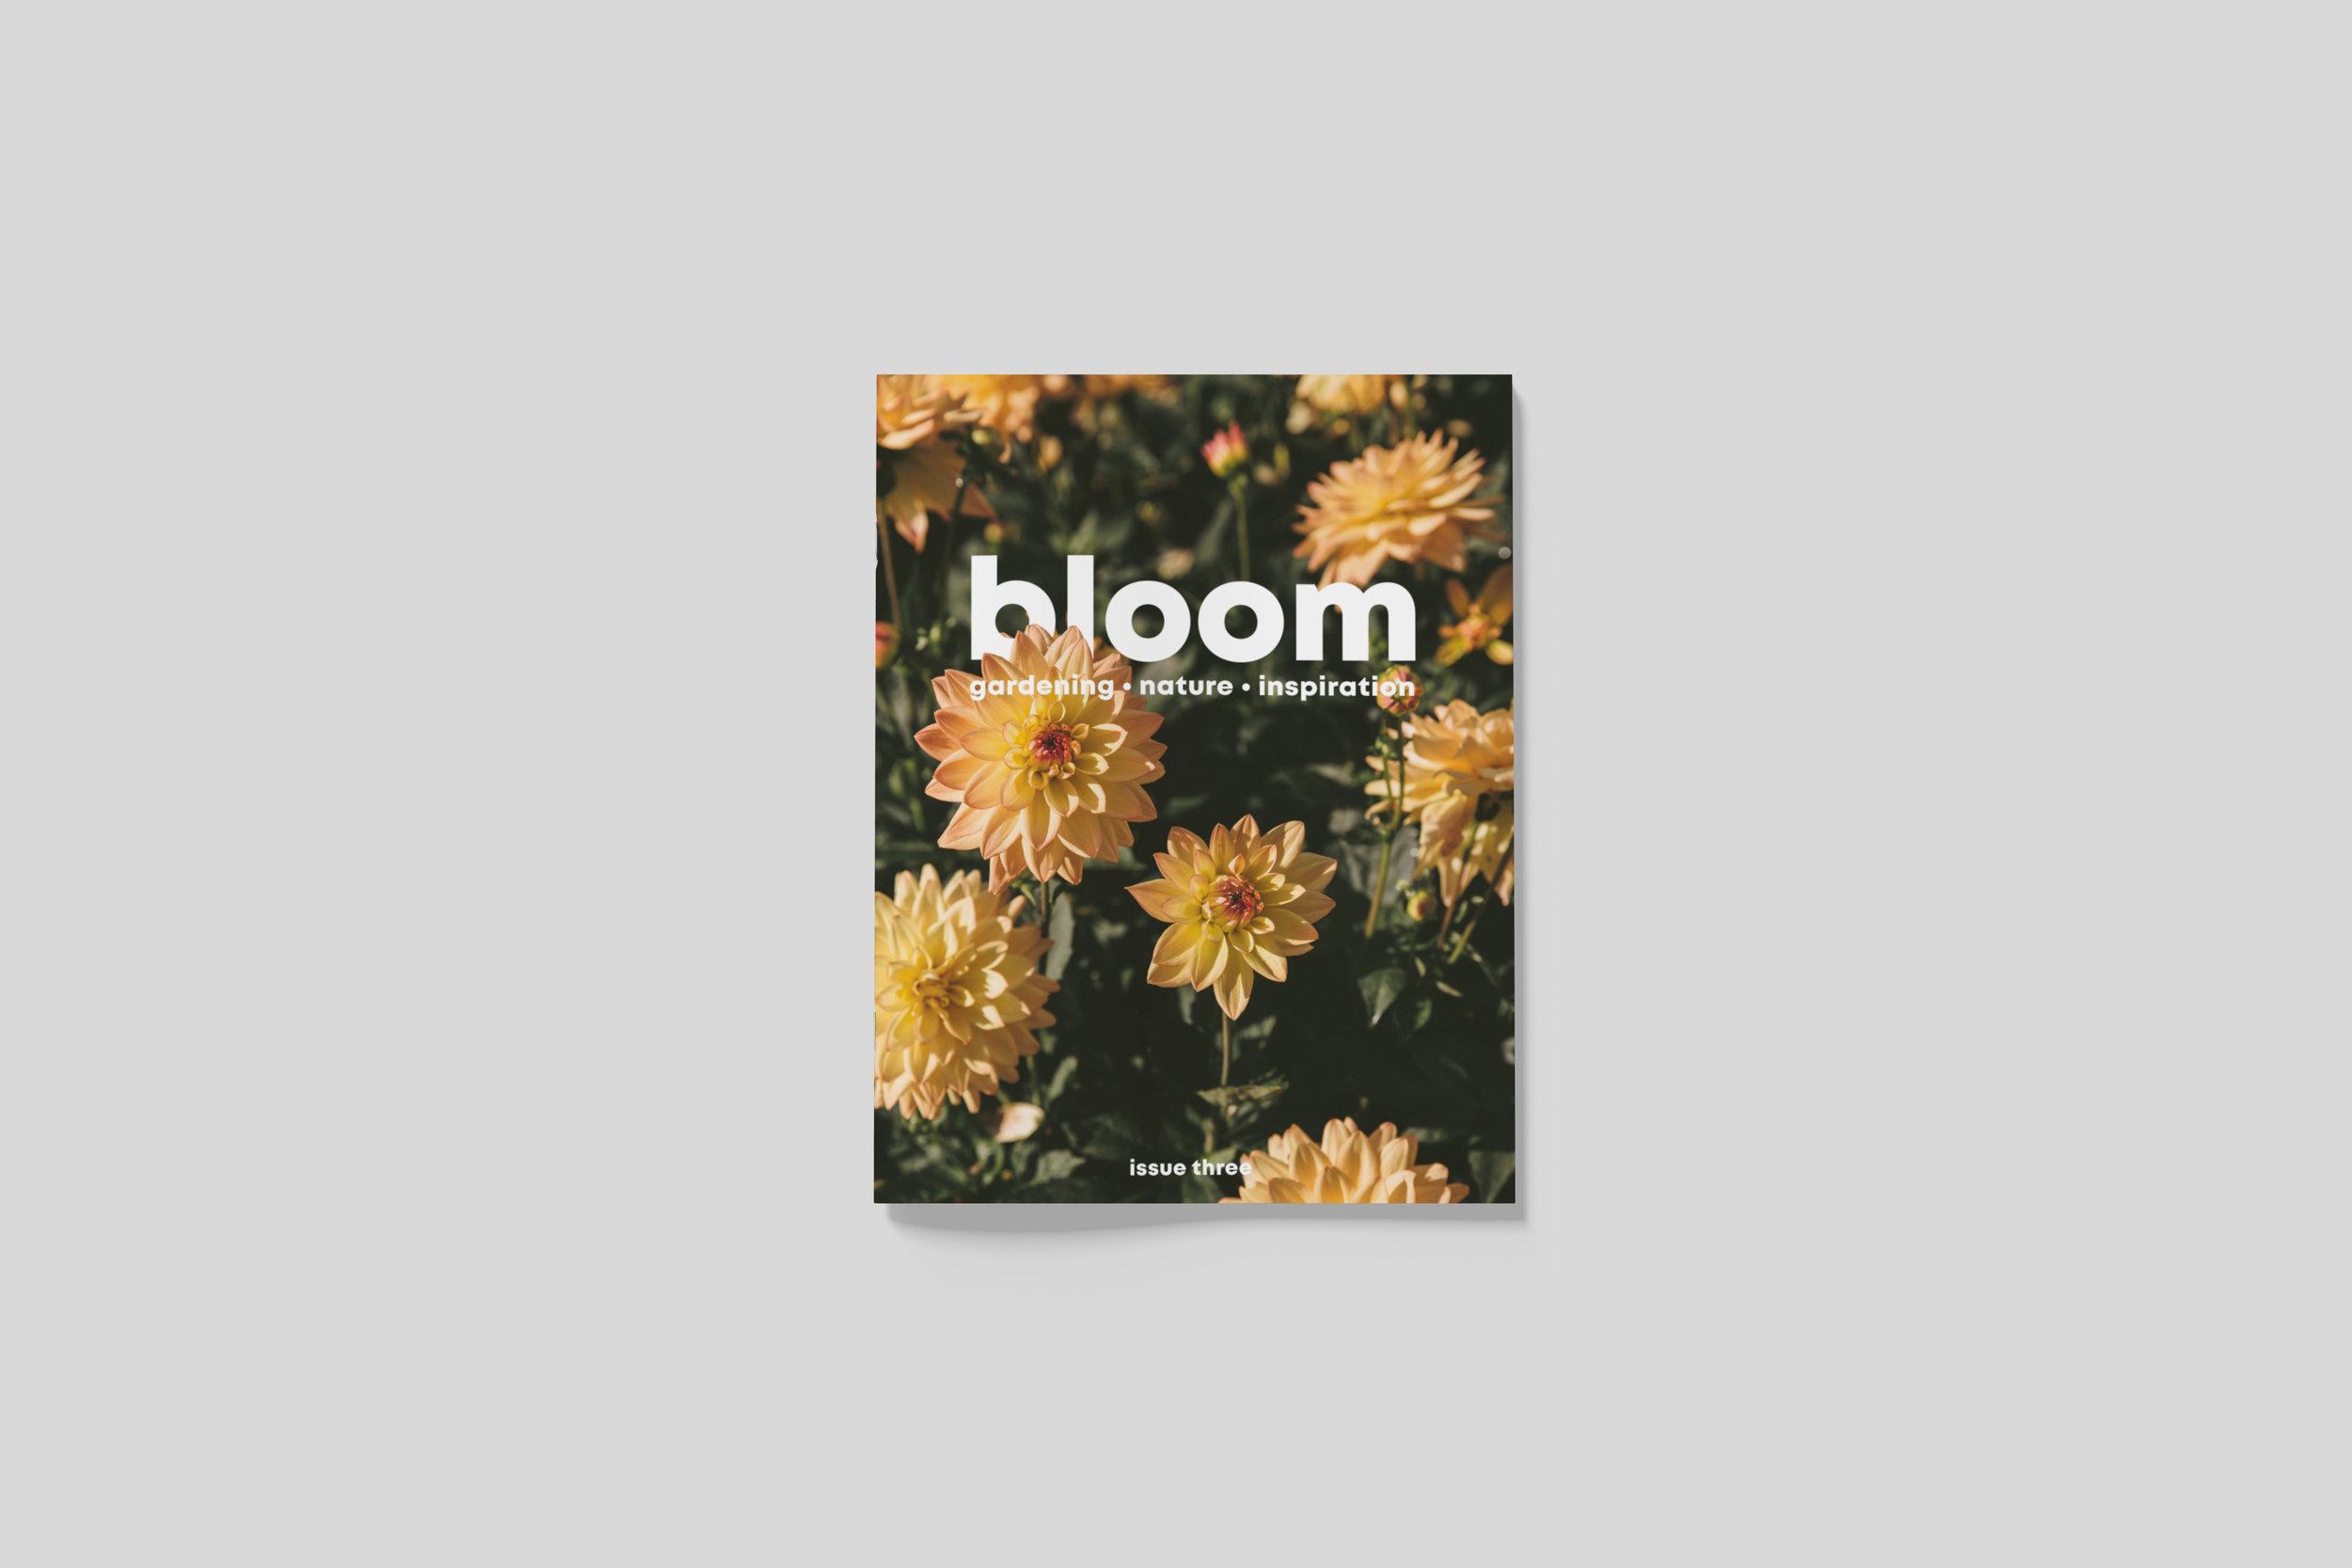 BloomIssue3_front_01.jpg